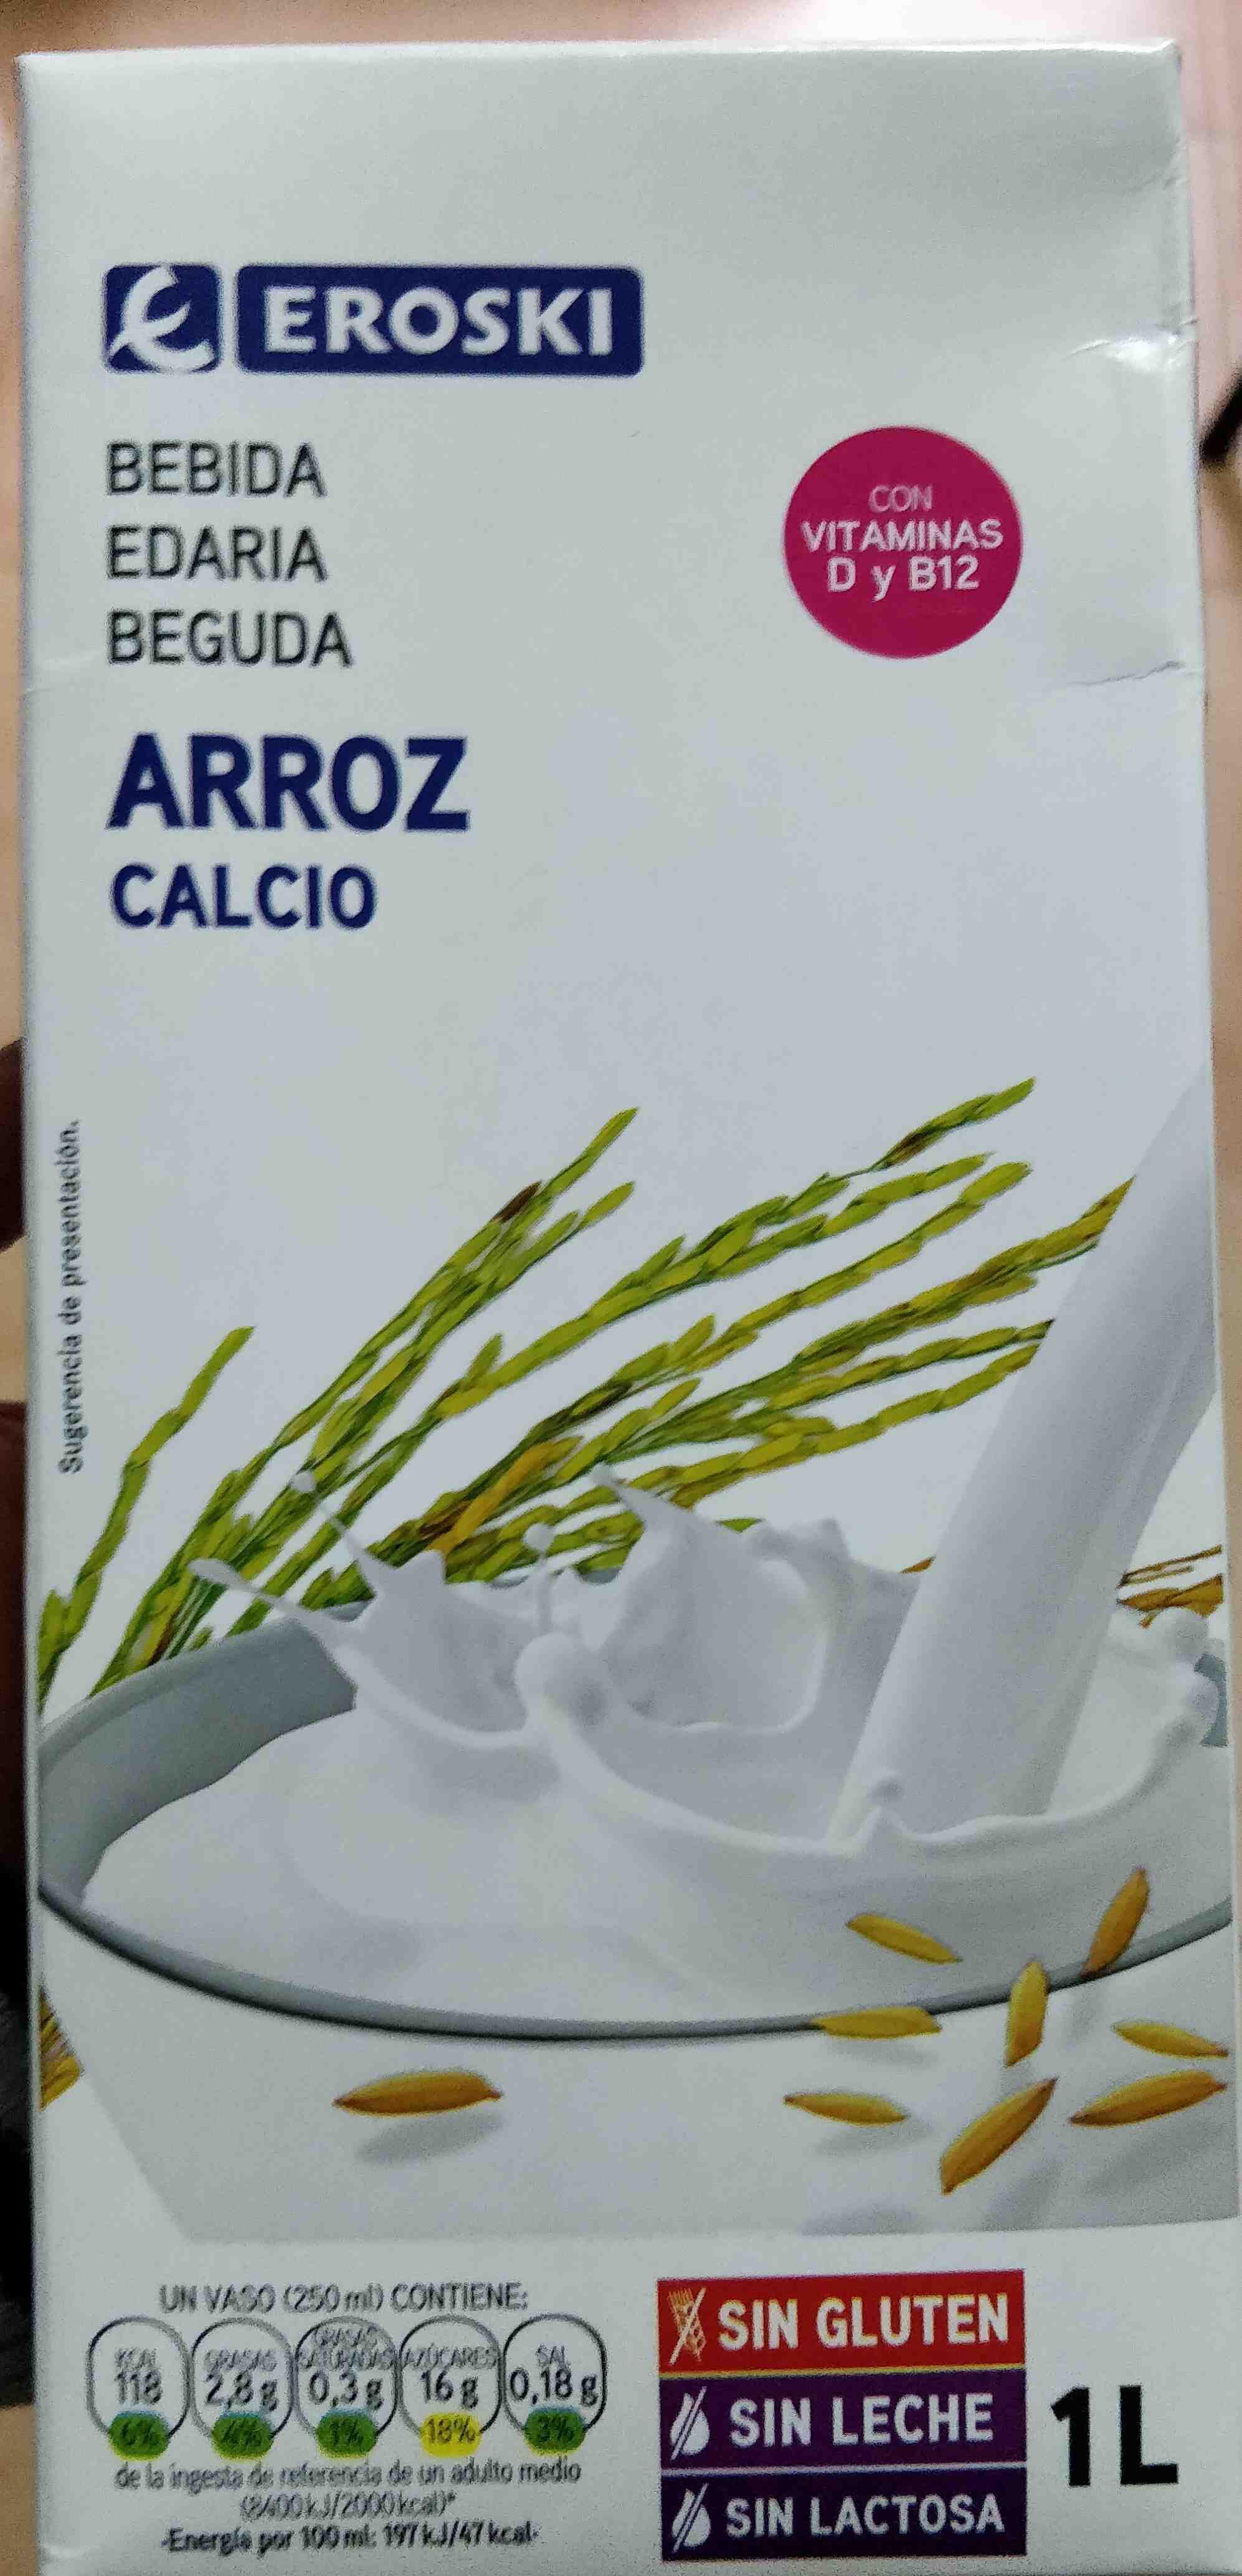 Bebida de arroz calcio - Product